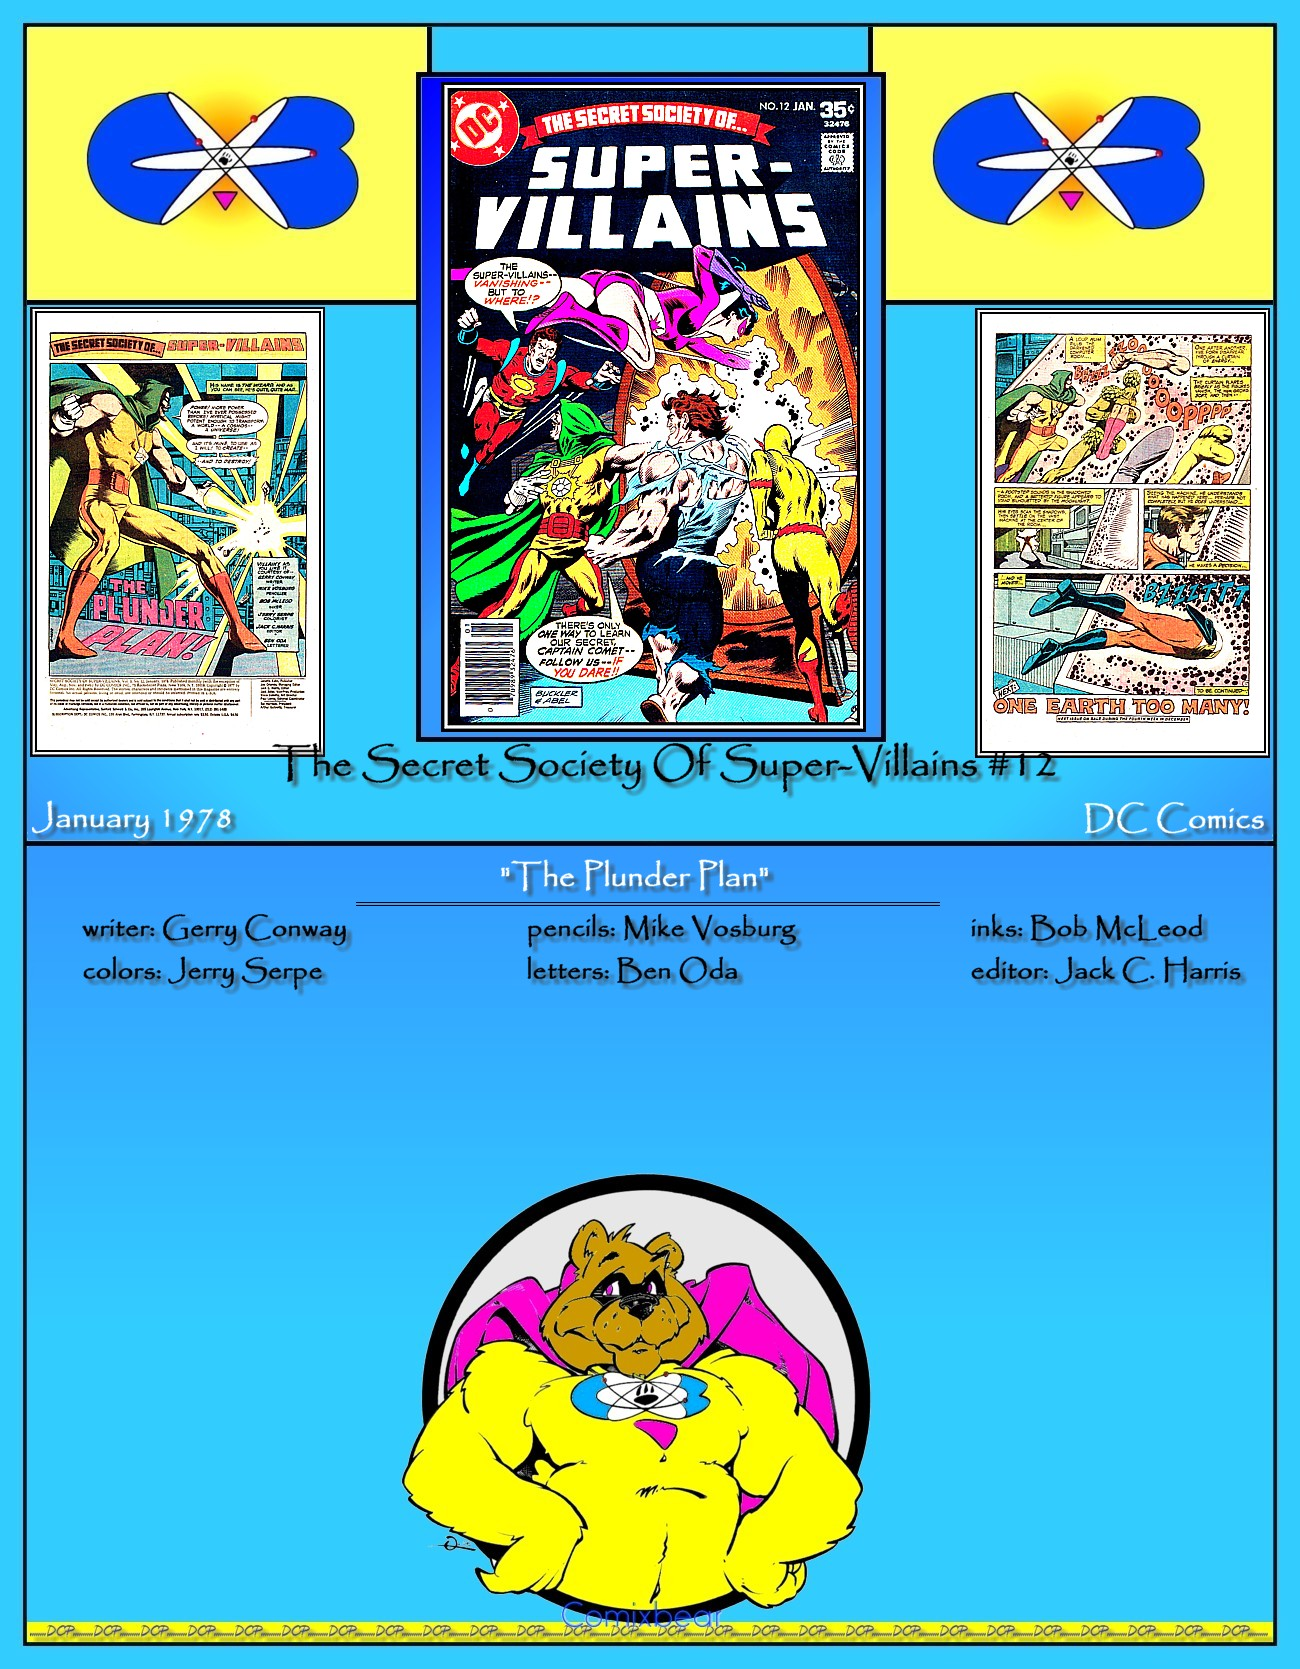 Read online Secret Society of Super-Villains comic -  Issue #12 - 37